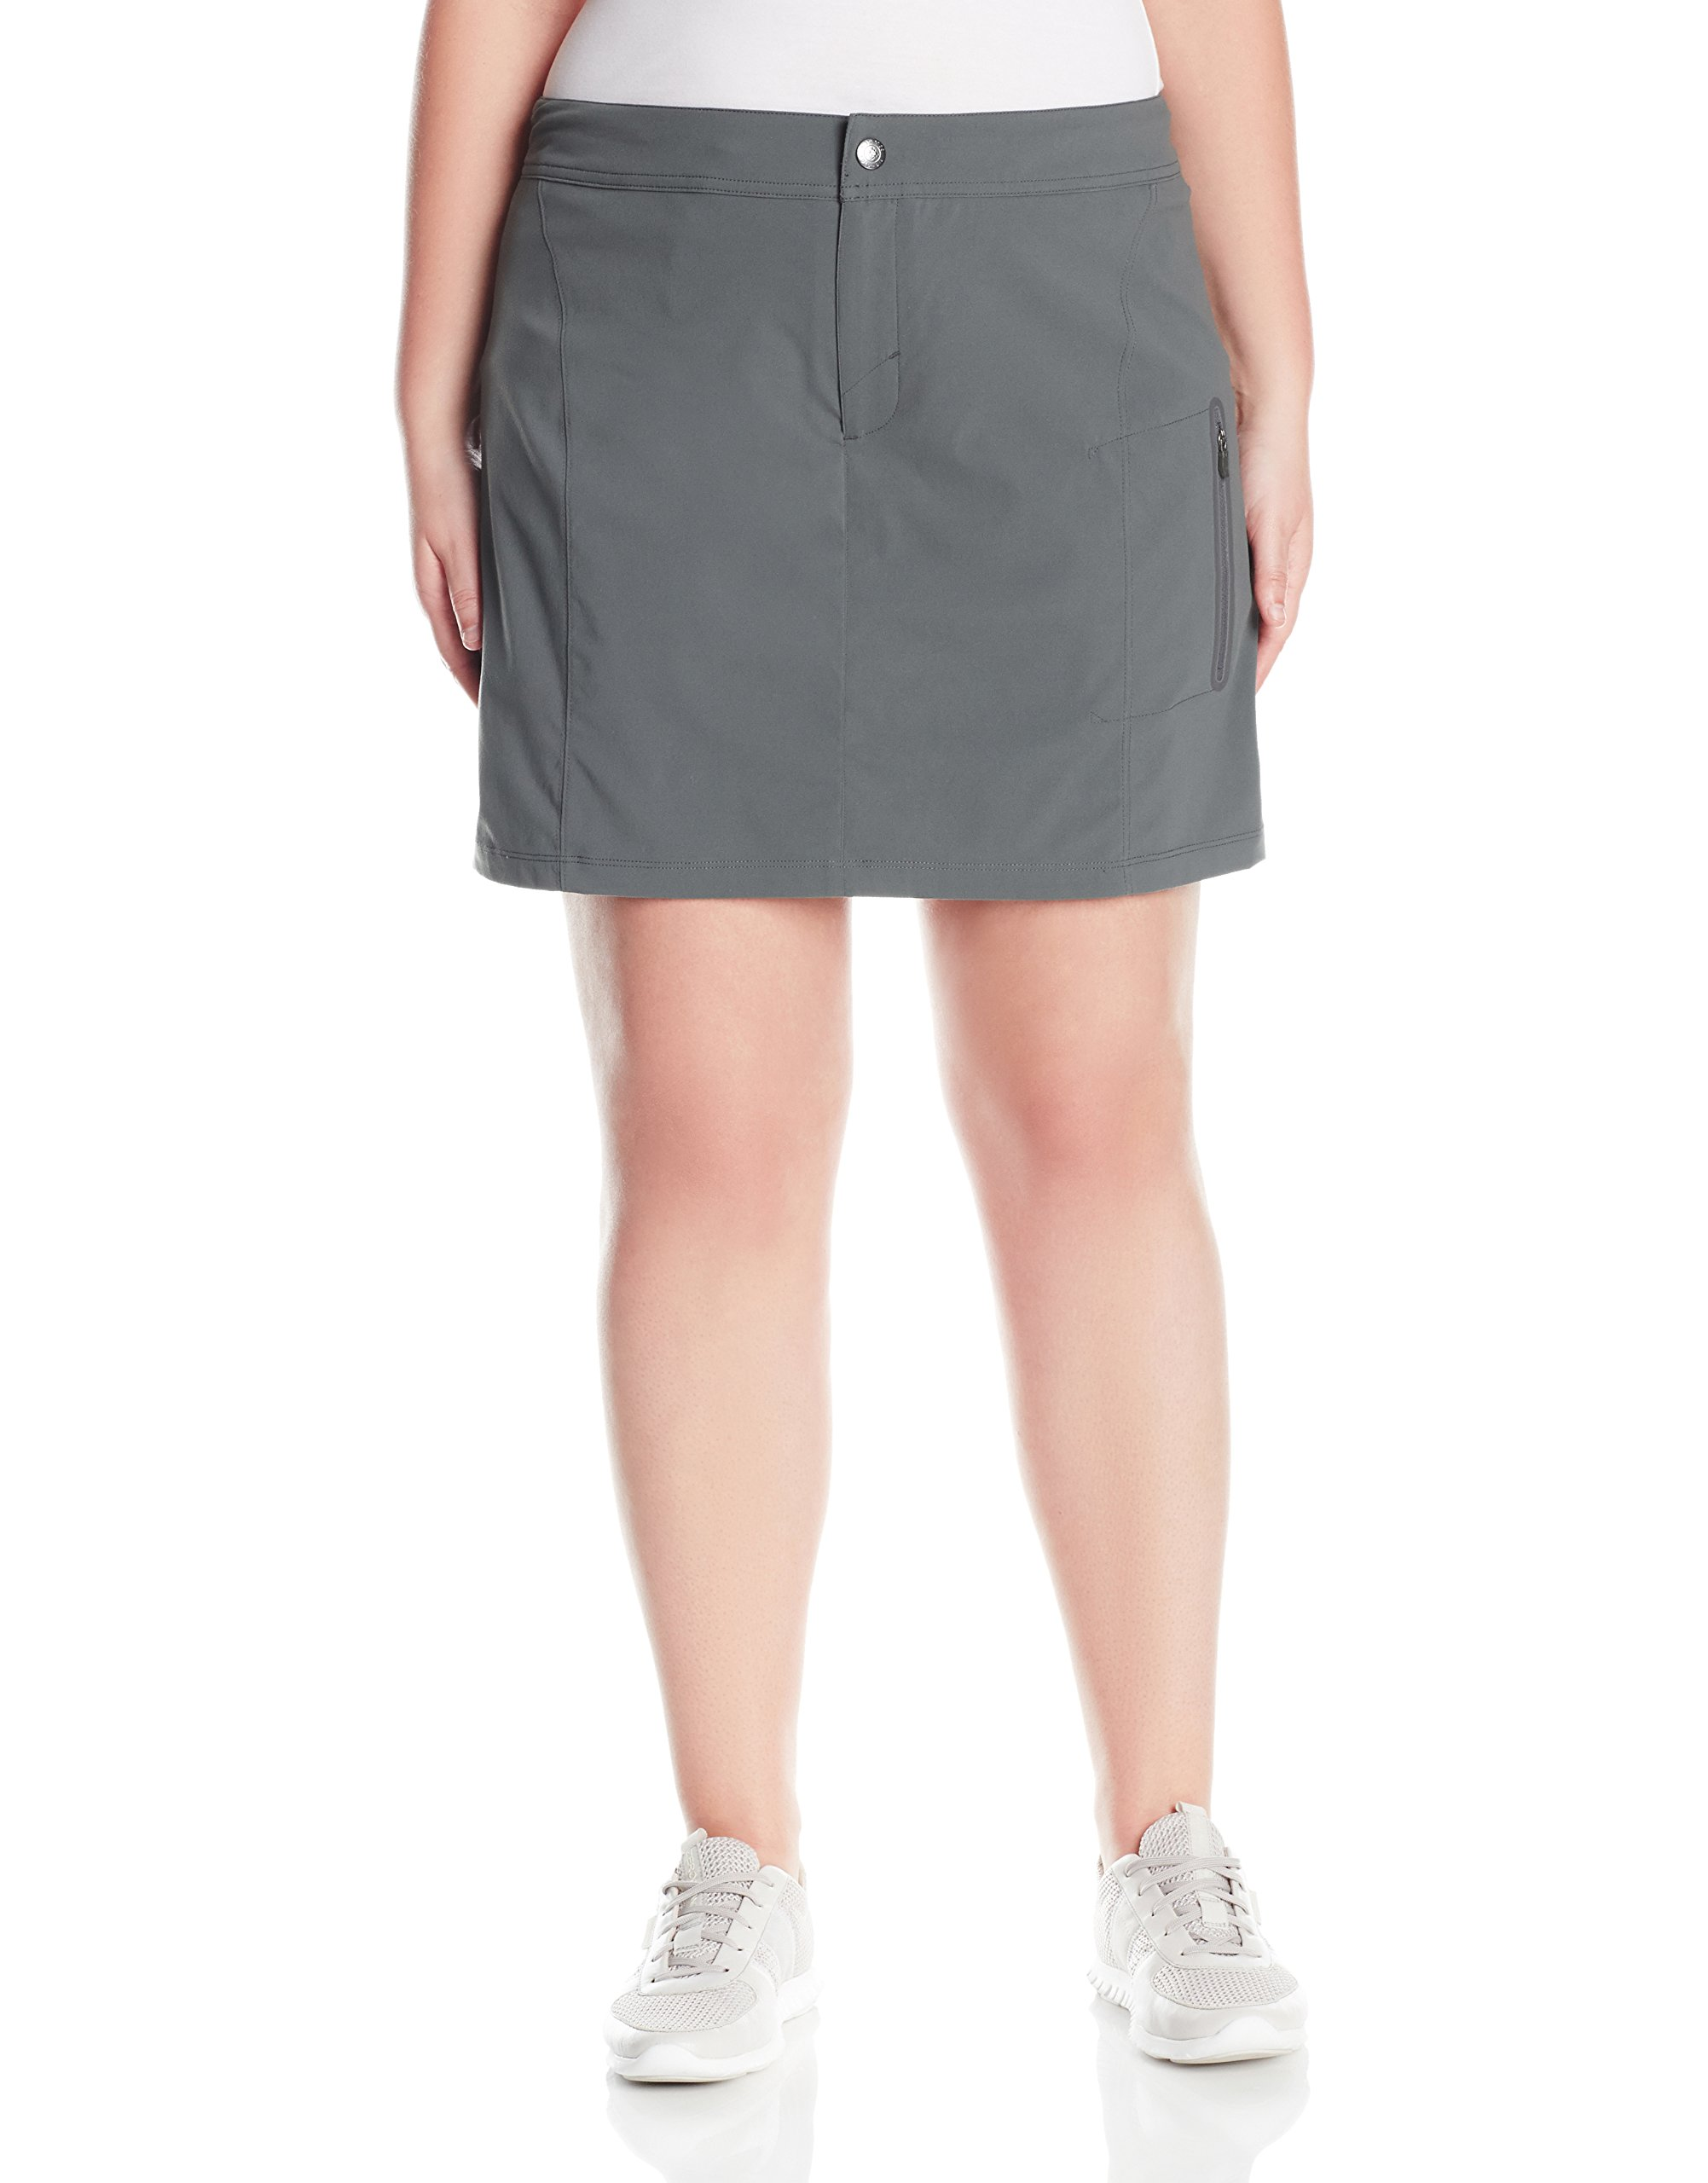 Columbia Women's Plus Size Just Right Skort, Grill, 18W